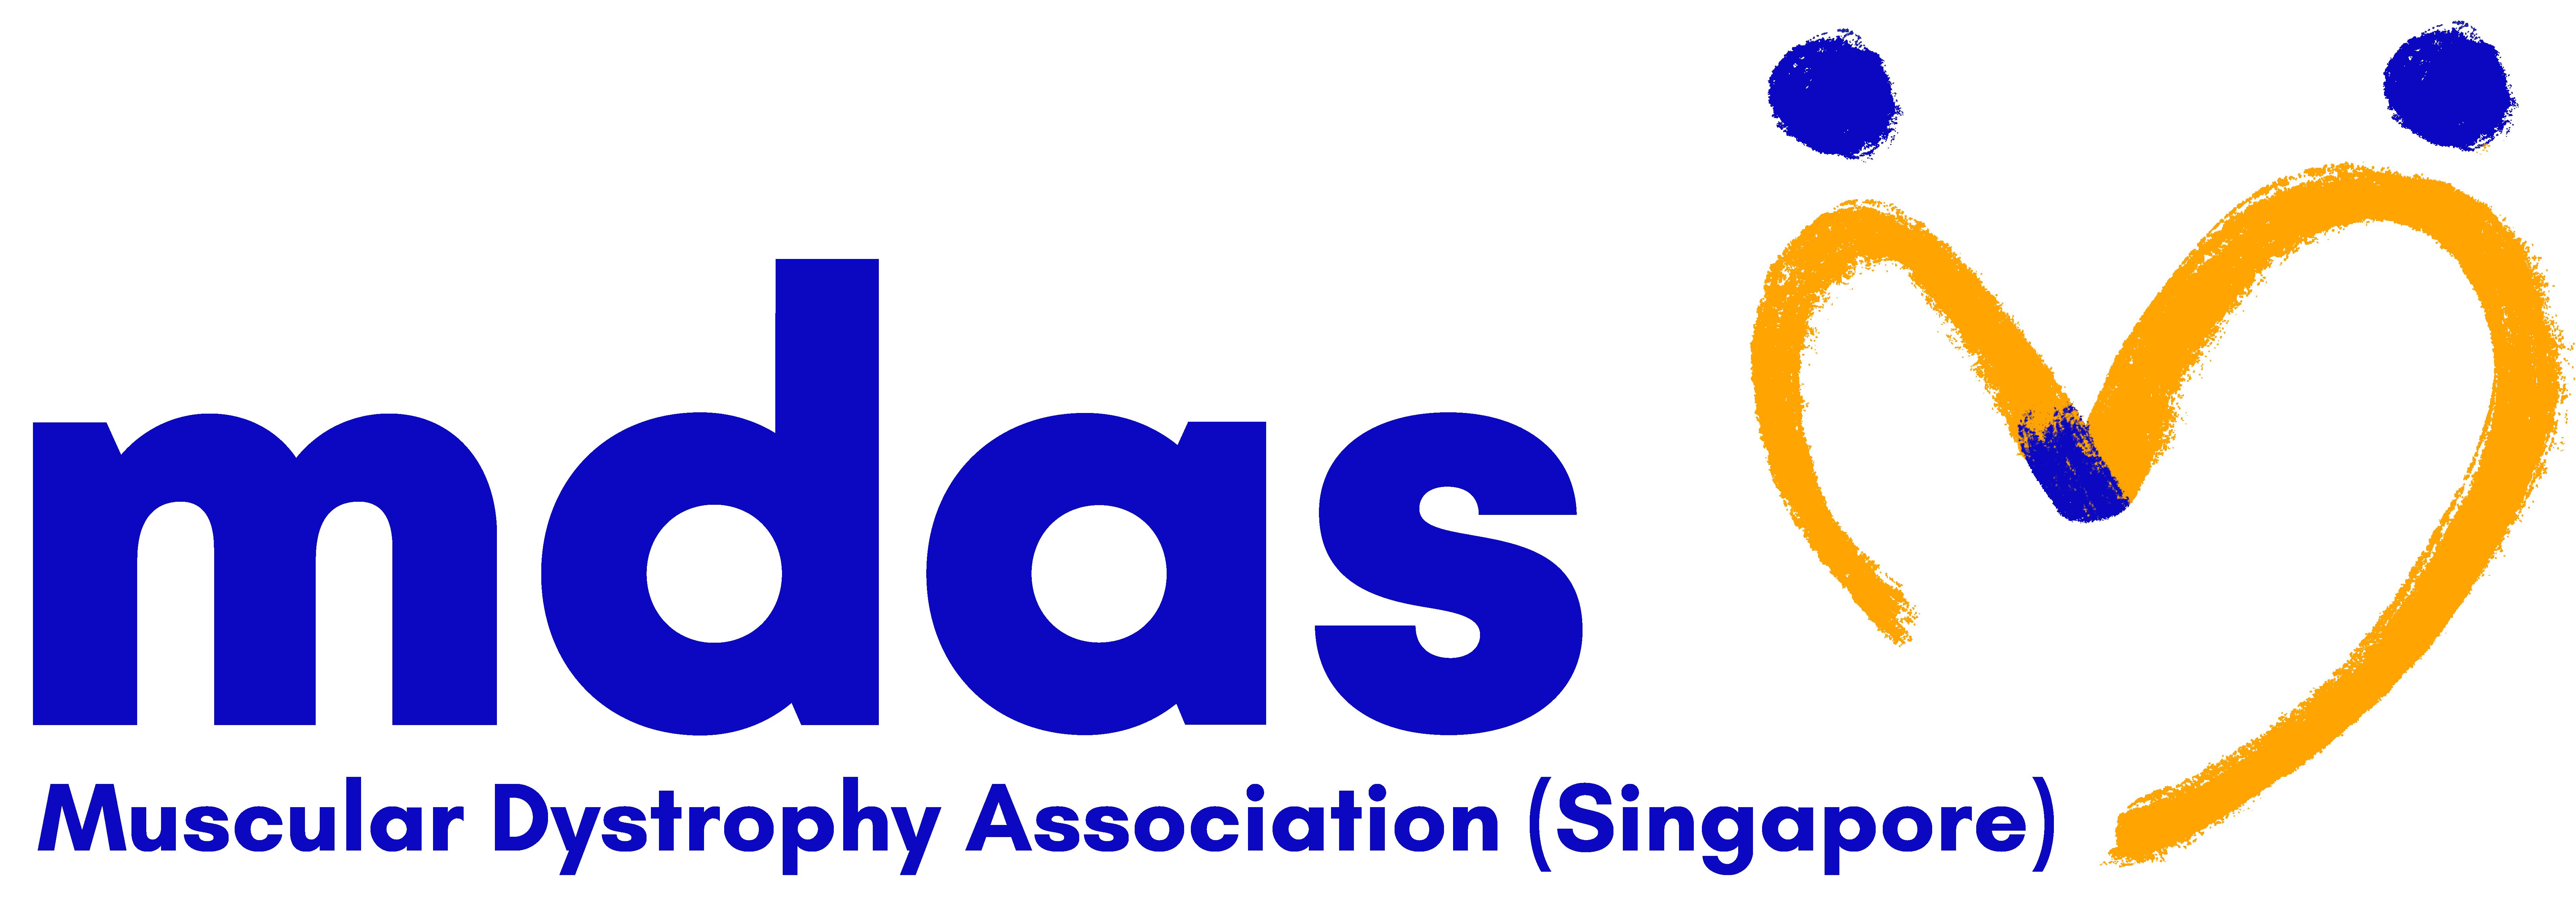 Muscular Dystrophy Association (Singapore)